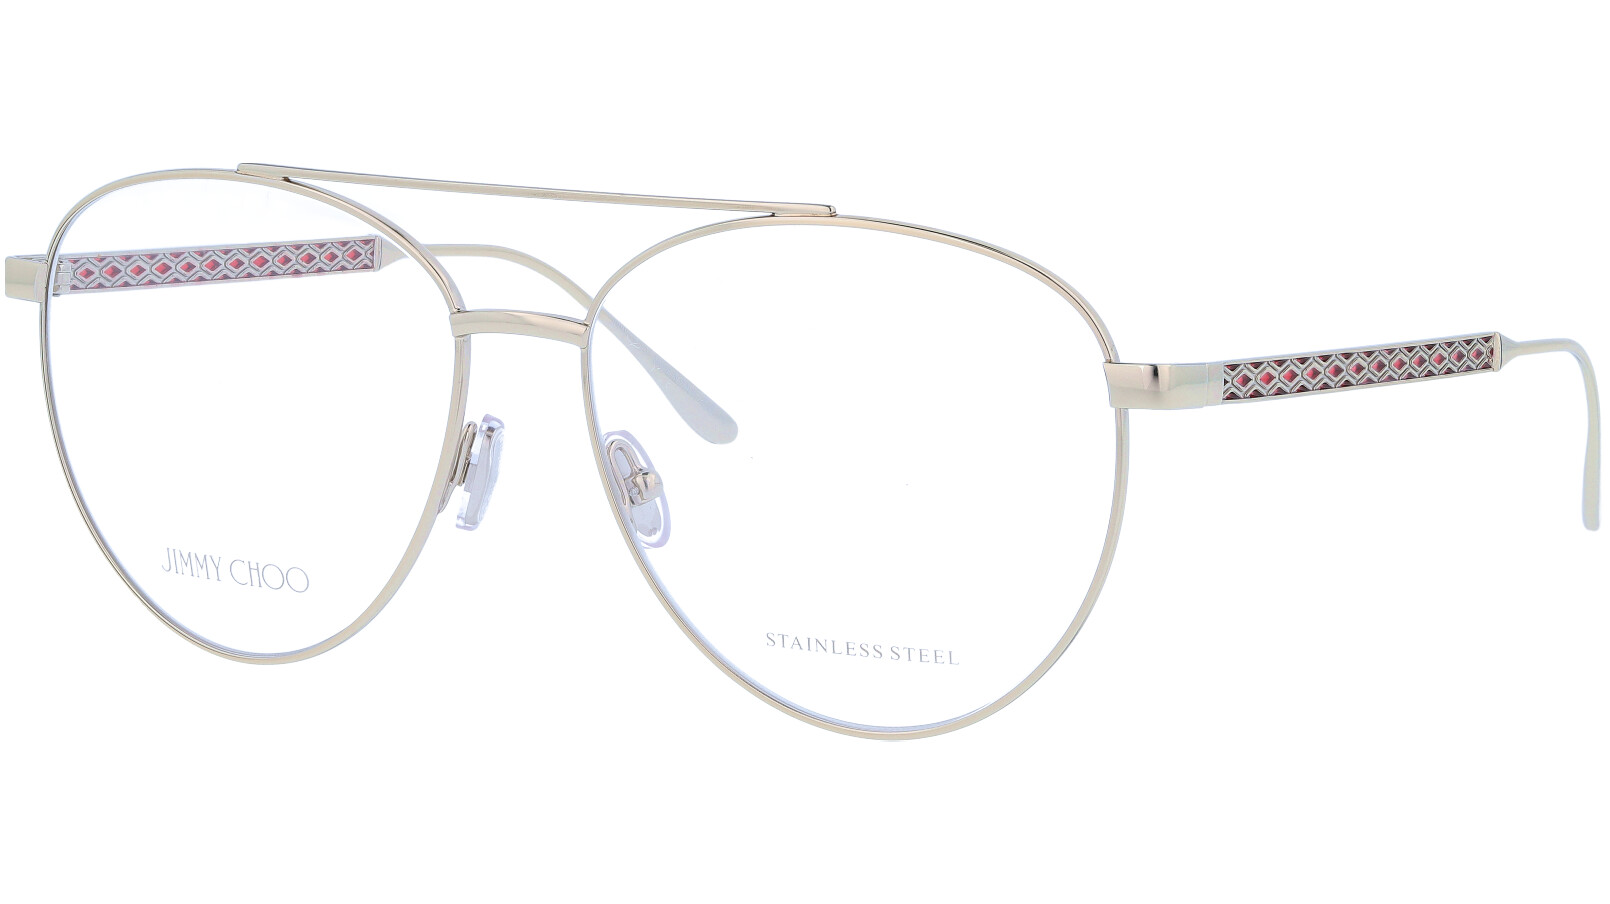 Jimmy Choo JC216 Y11 58 Gold Glasses